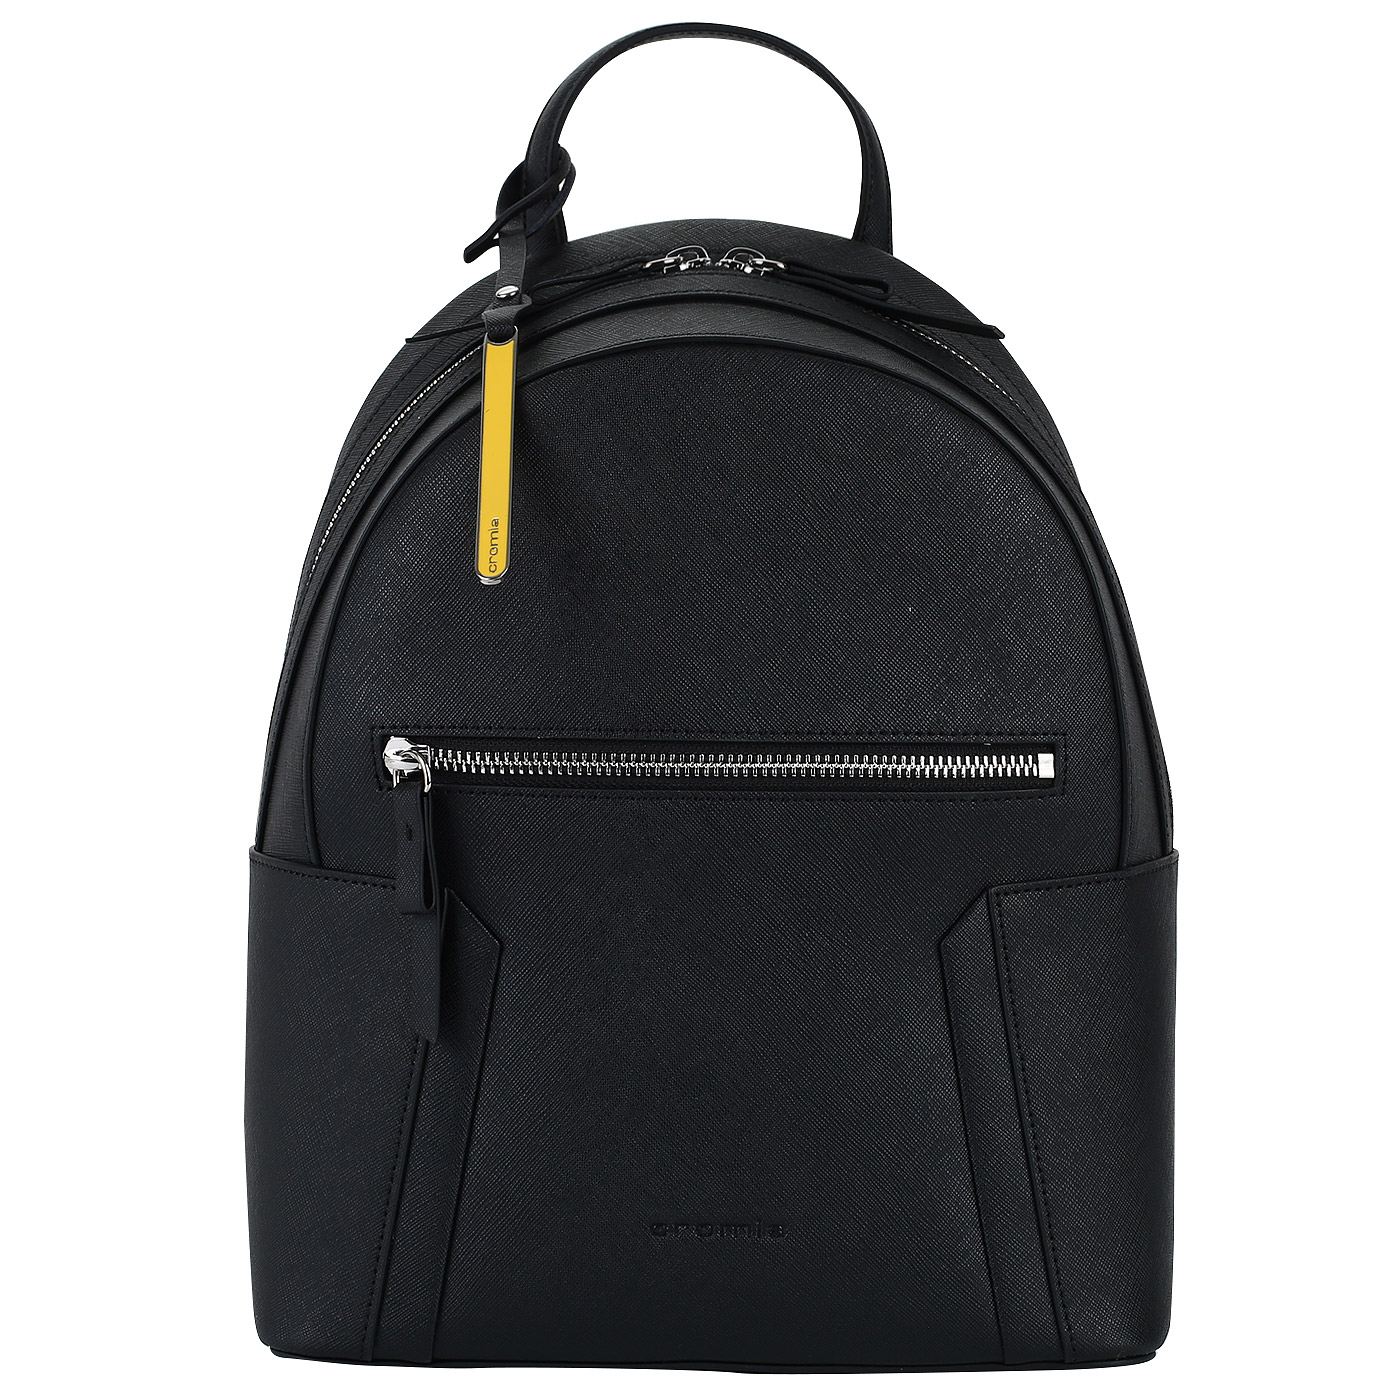 679a2bbaed2d Женский рюкзак со съемными плечевыми лямками Cromia Wisper ...